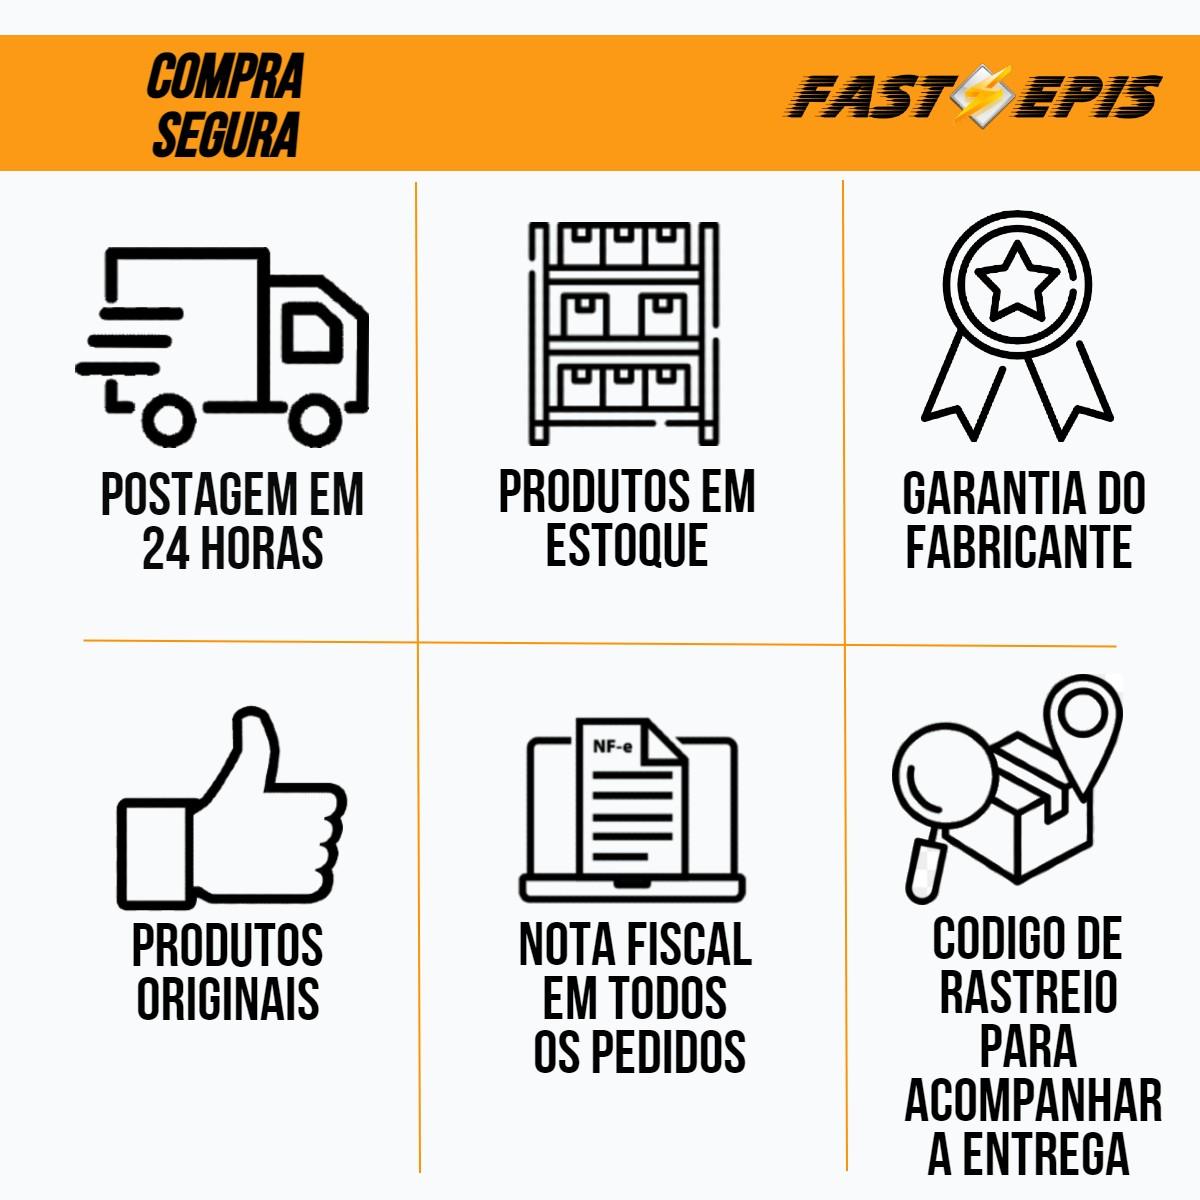 Luva de Raspa Especial com Lona Extra Forte Work-tek - Teknoluvas